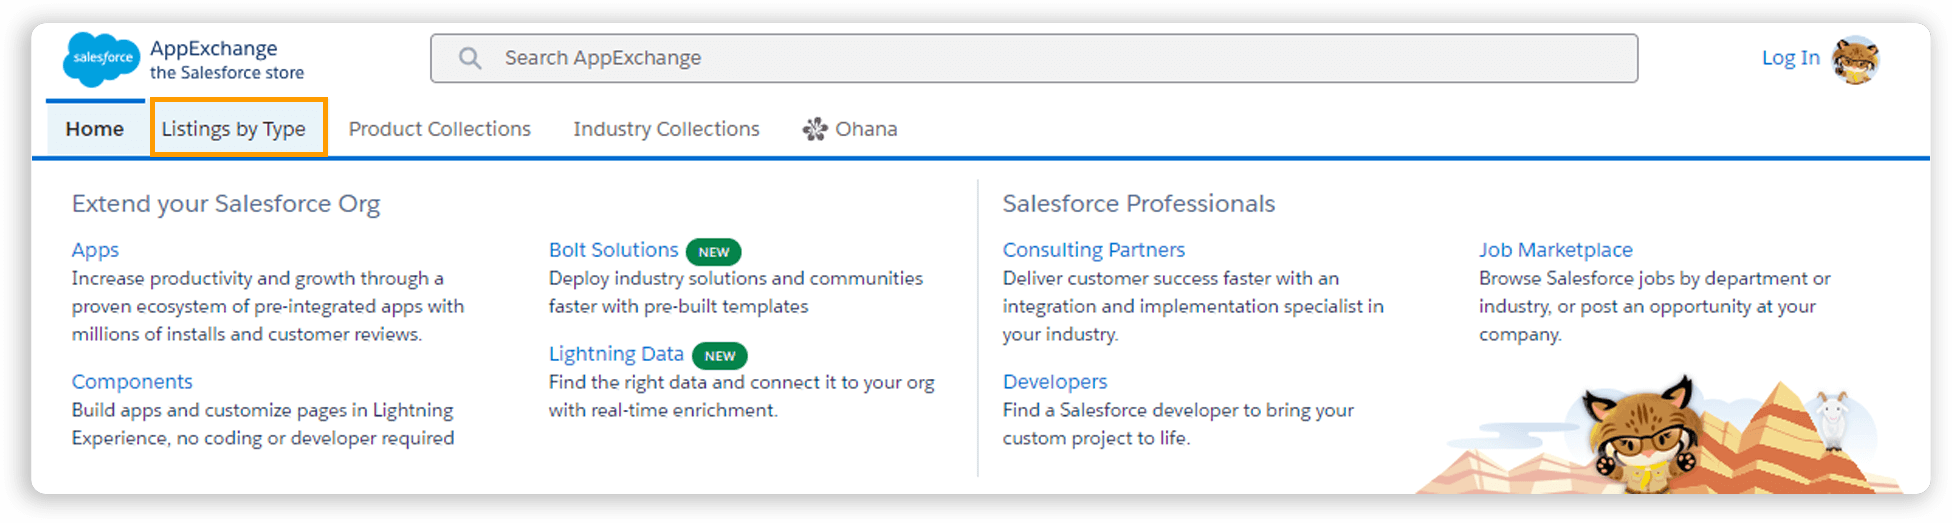 Salesforce App Listings by Type on AppExchange